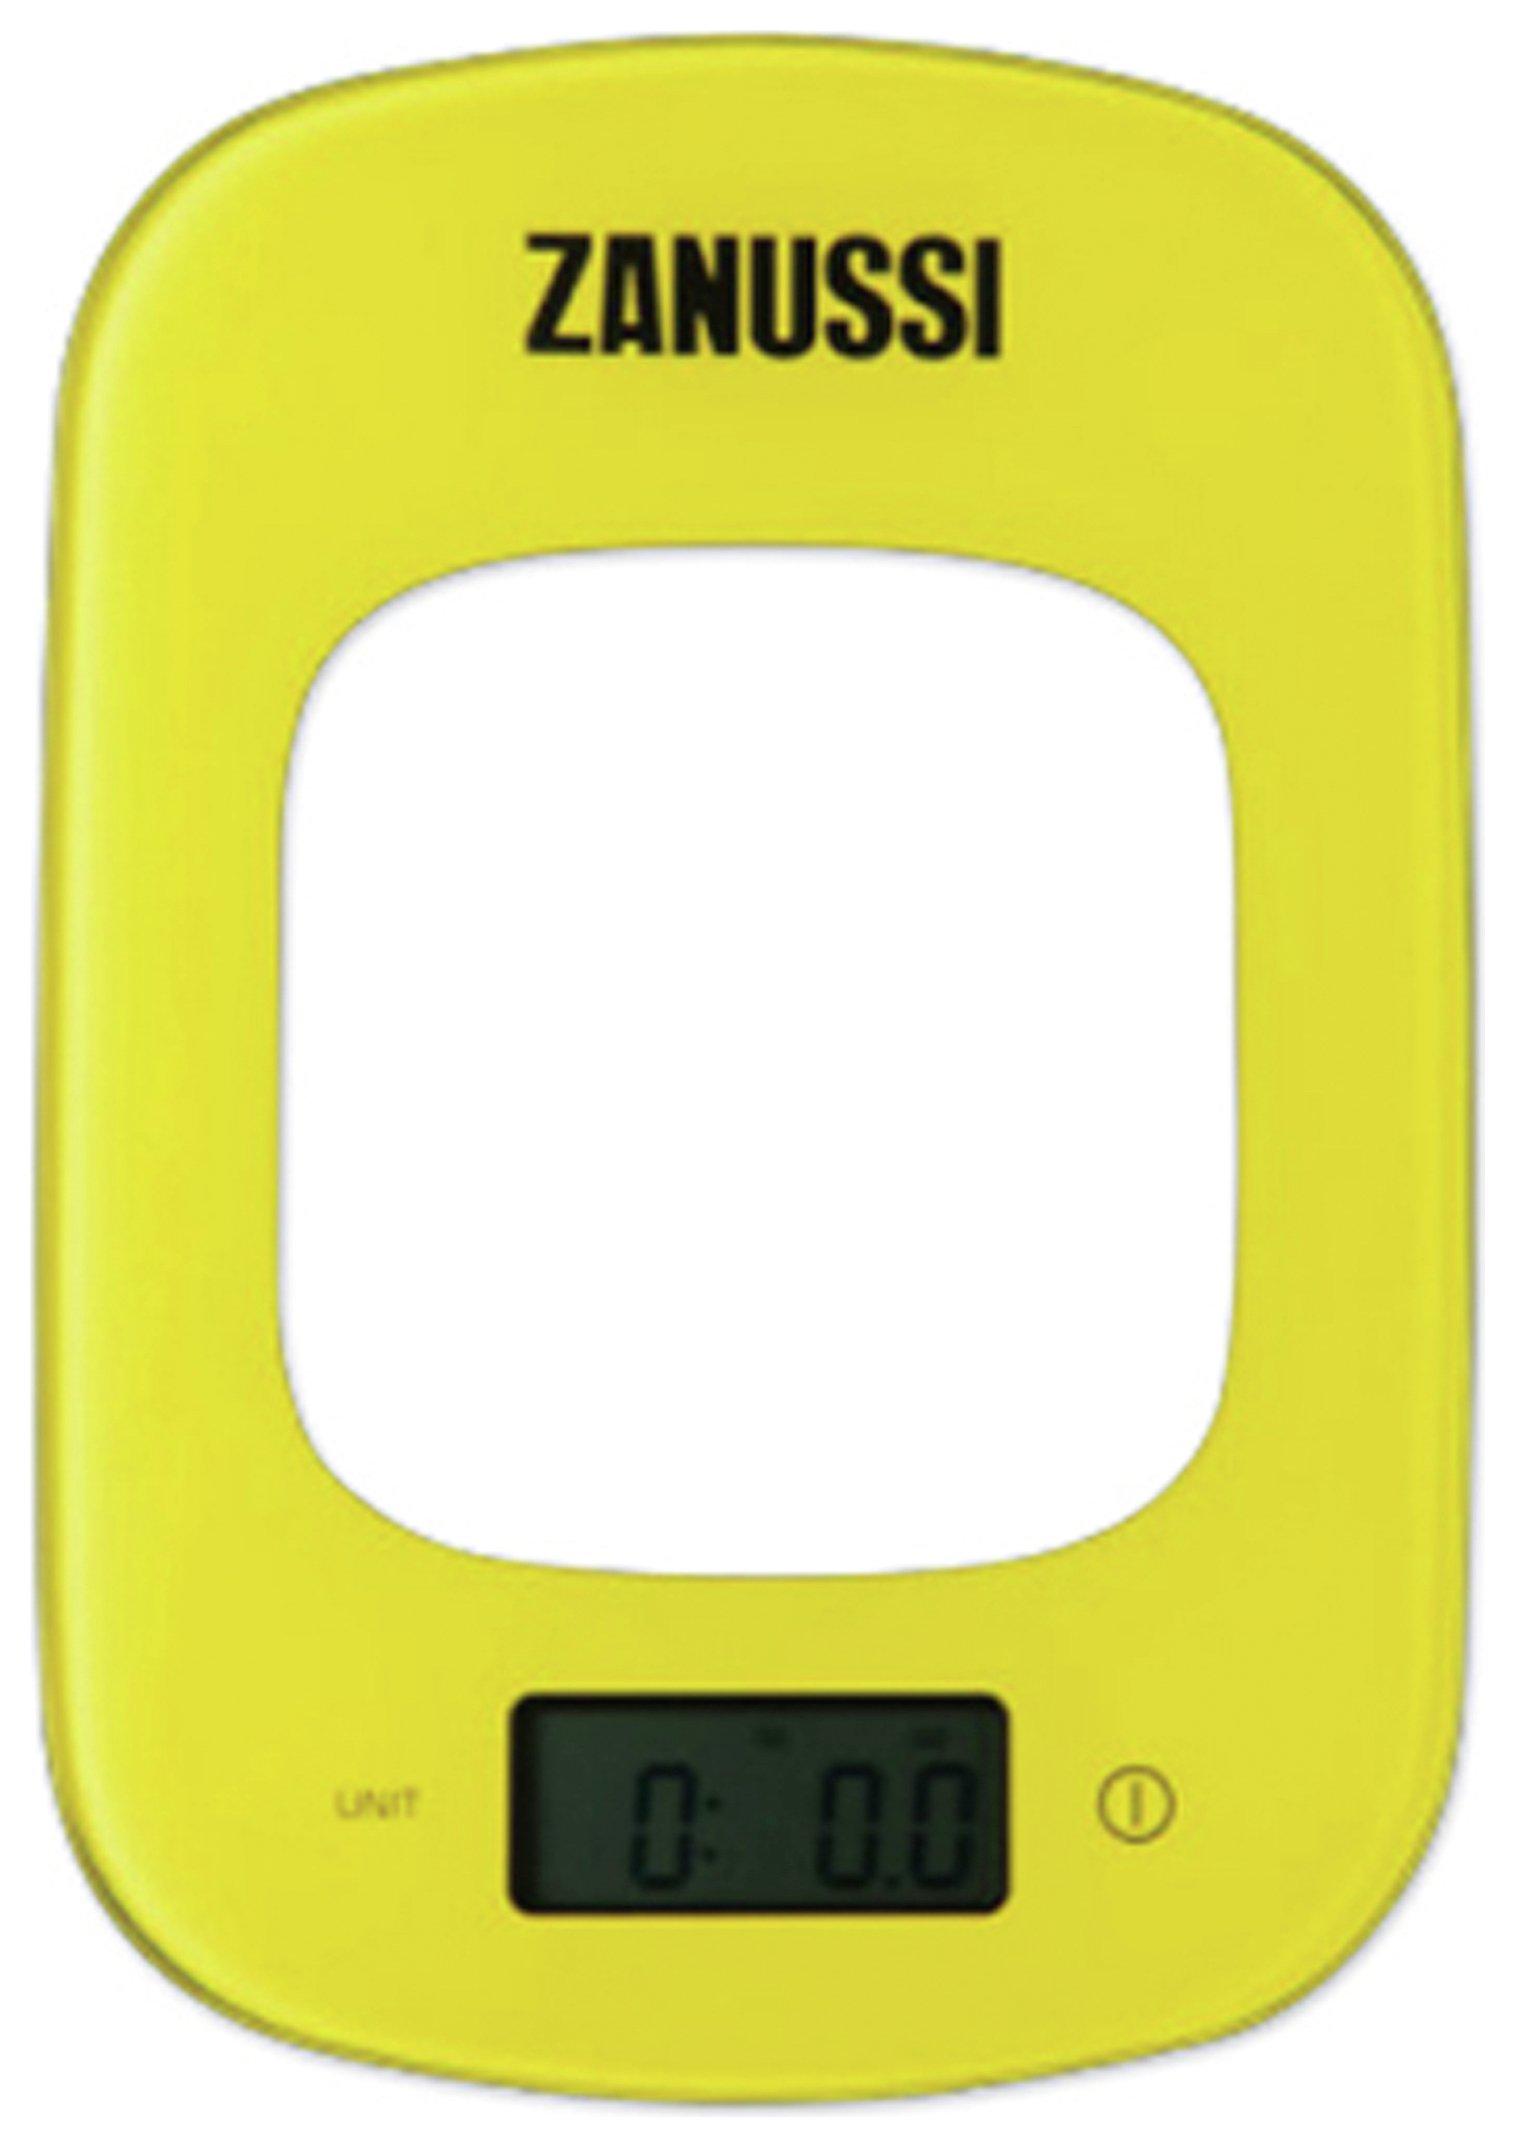 Zanussi Digital Kitchen Scales - Yellow